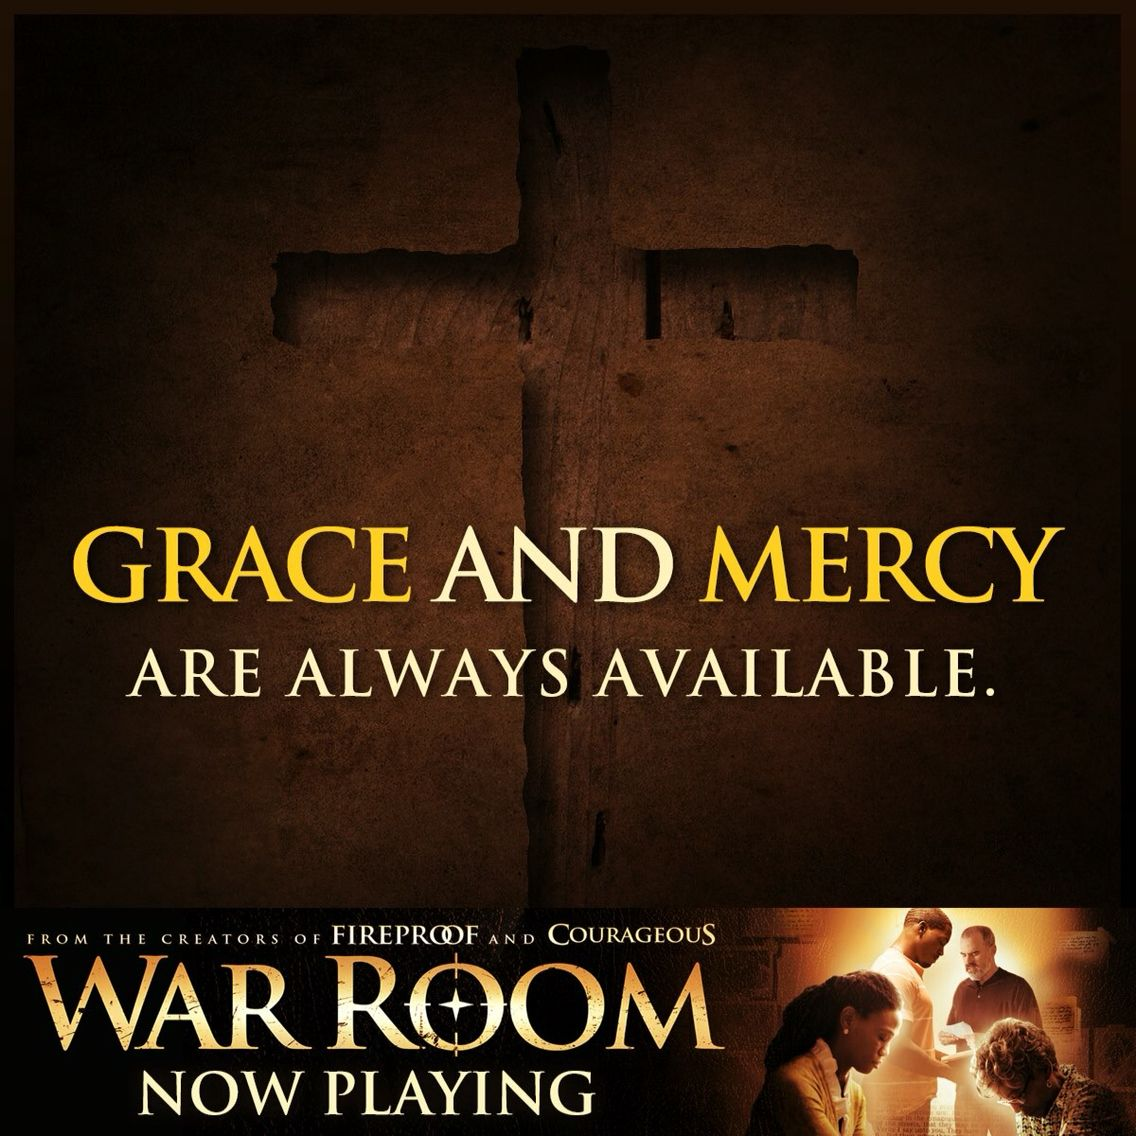 Wisdom Quotes Bible Pinlauryn Poore On War Room  Pinterest  Gospel Quotes Bible